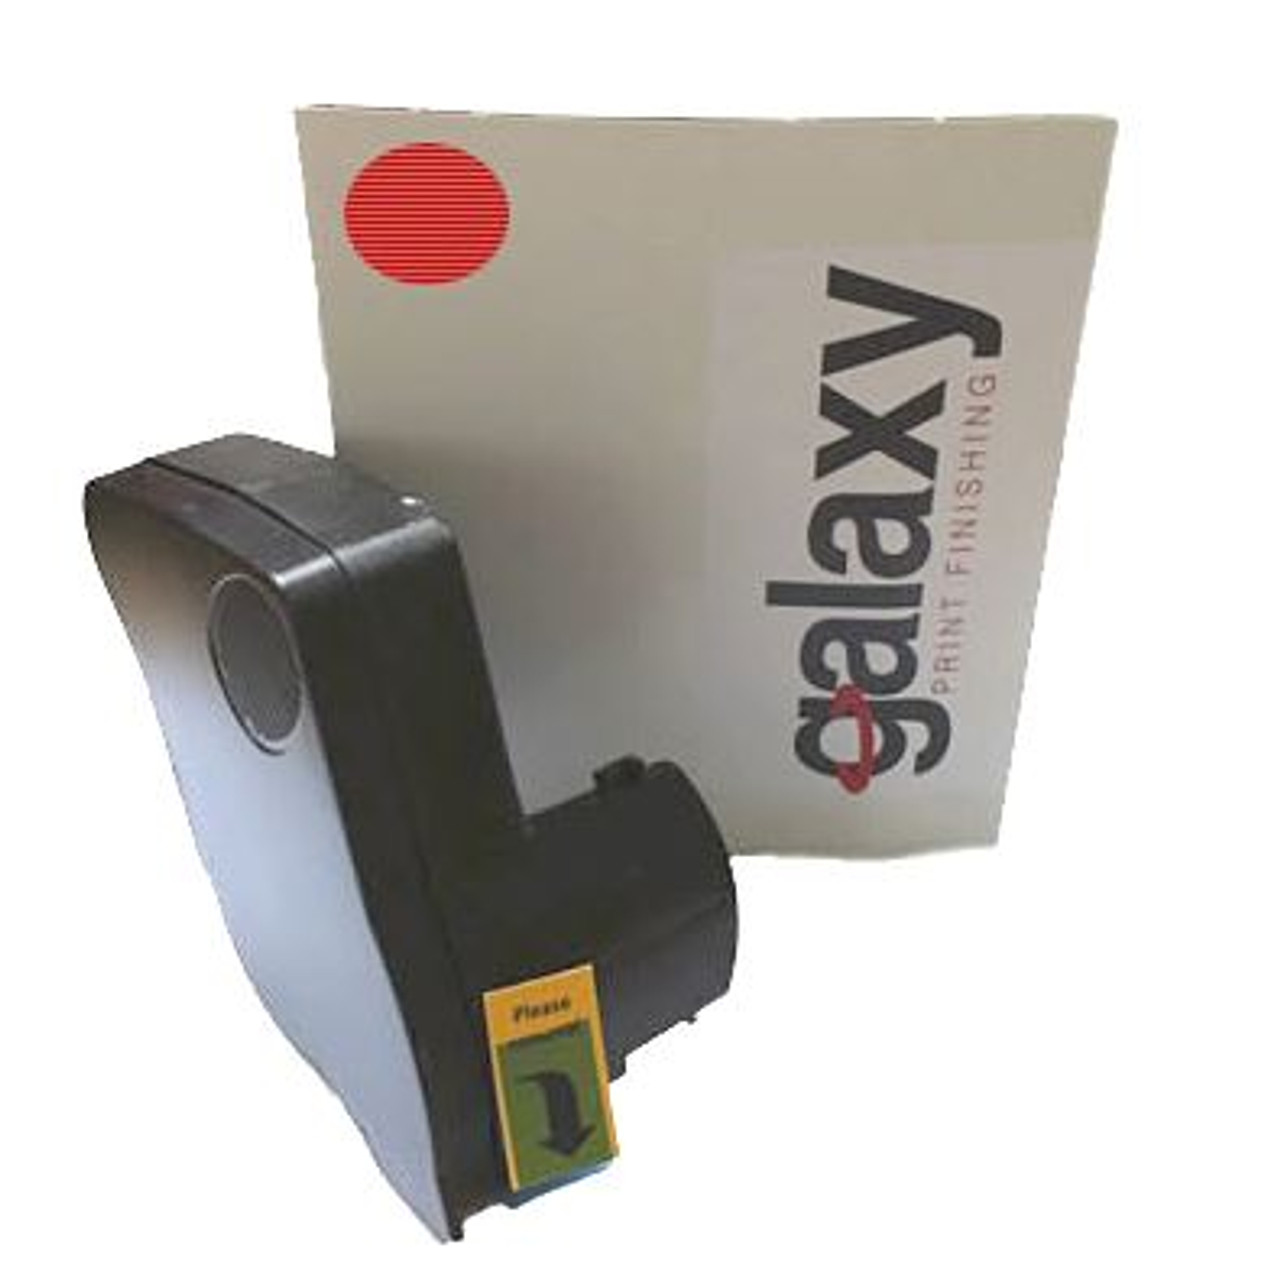 Compatible NEOPOST / QUADIENT IJ25 Franking Ink Cartridge